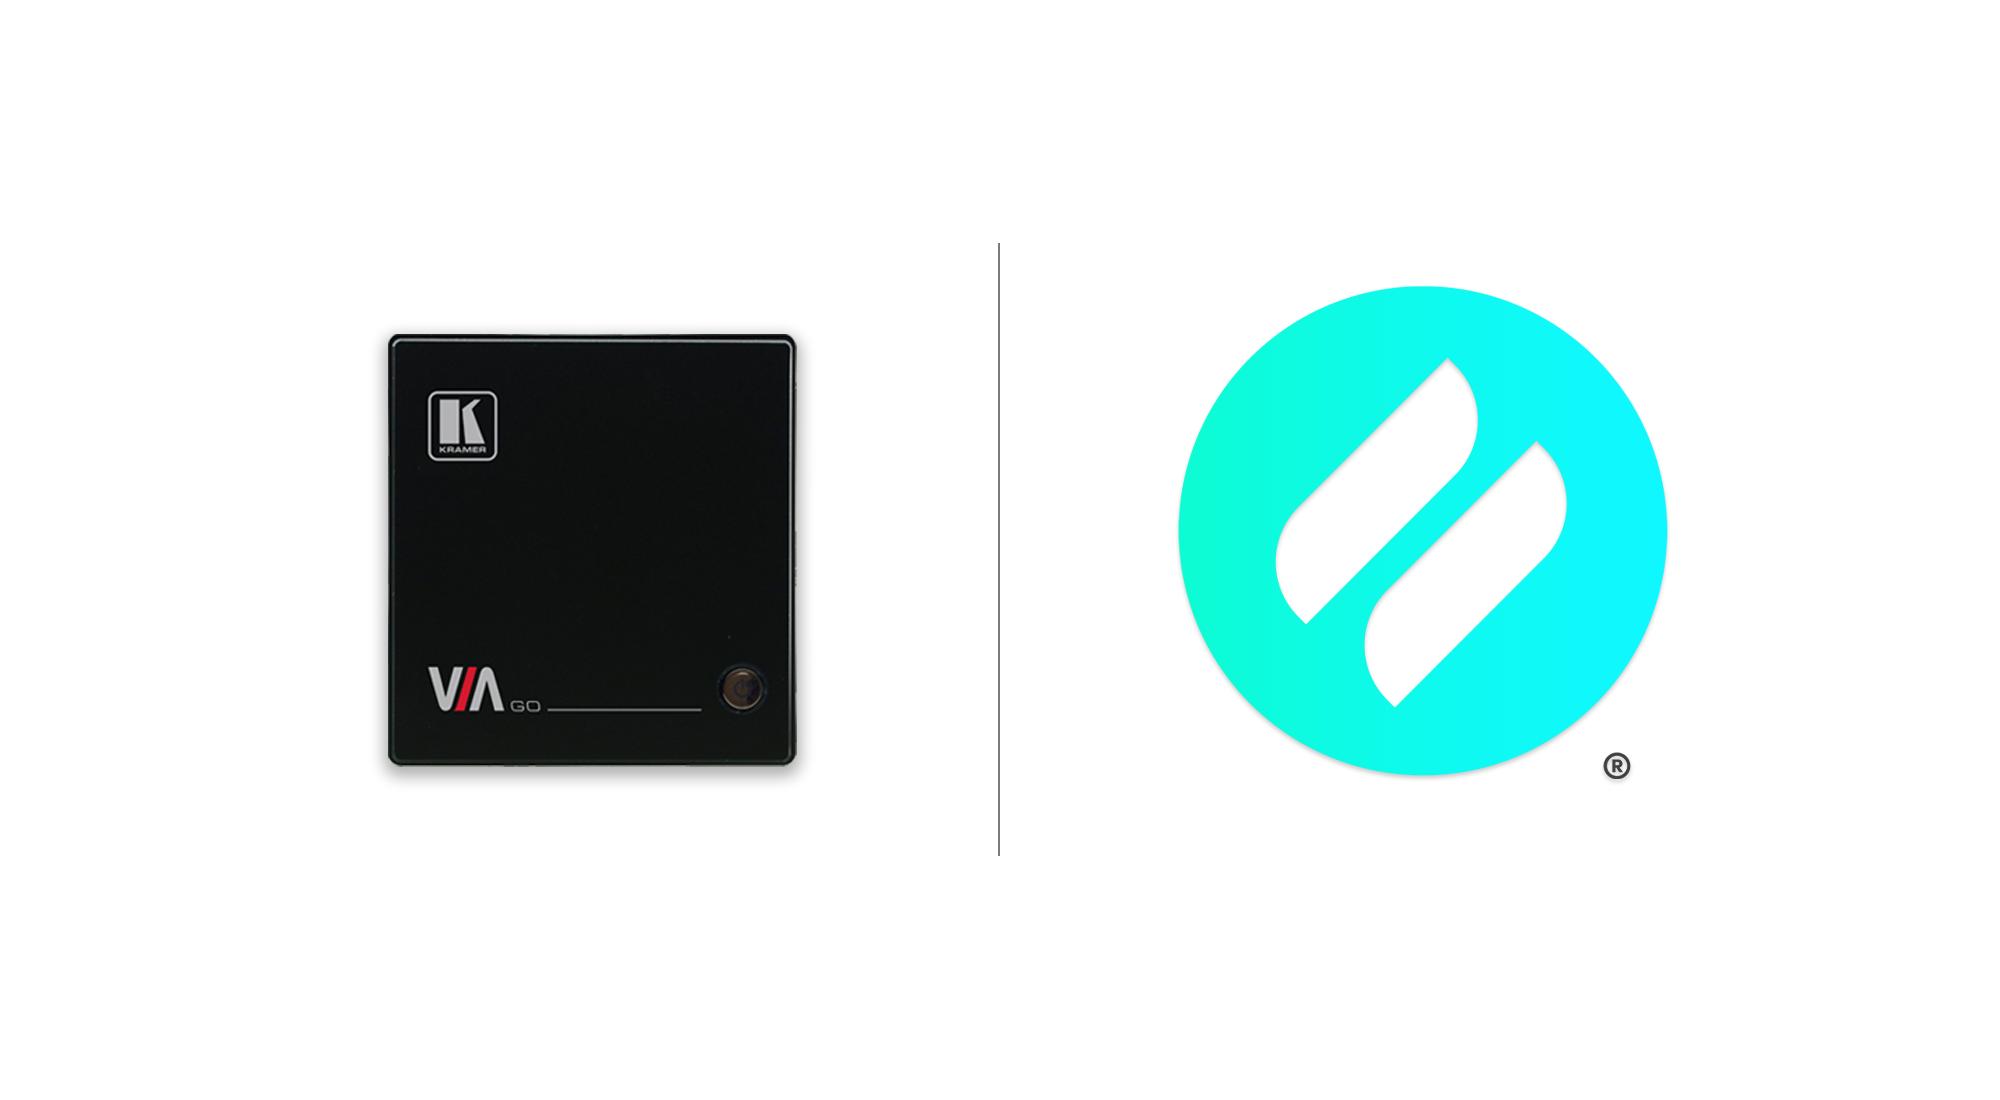 ditto logo and kramer via go device